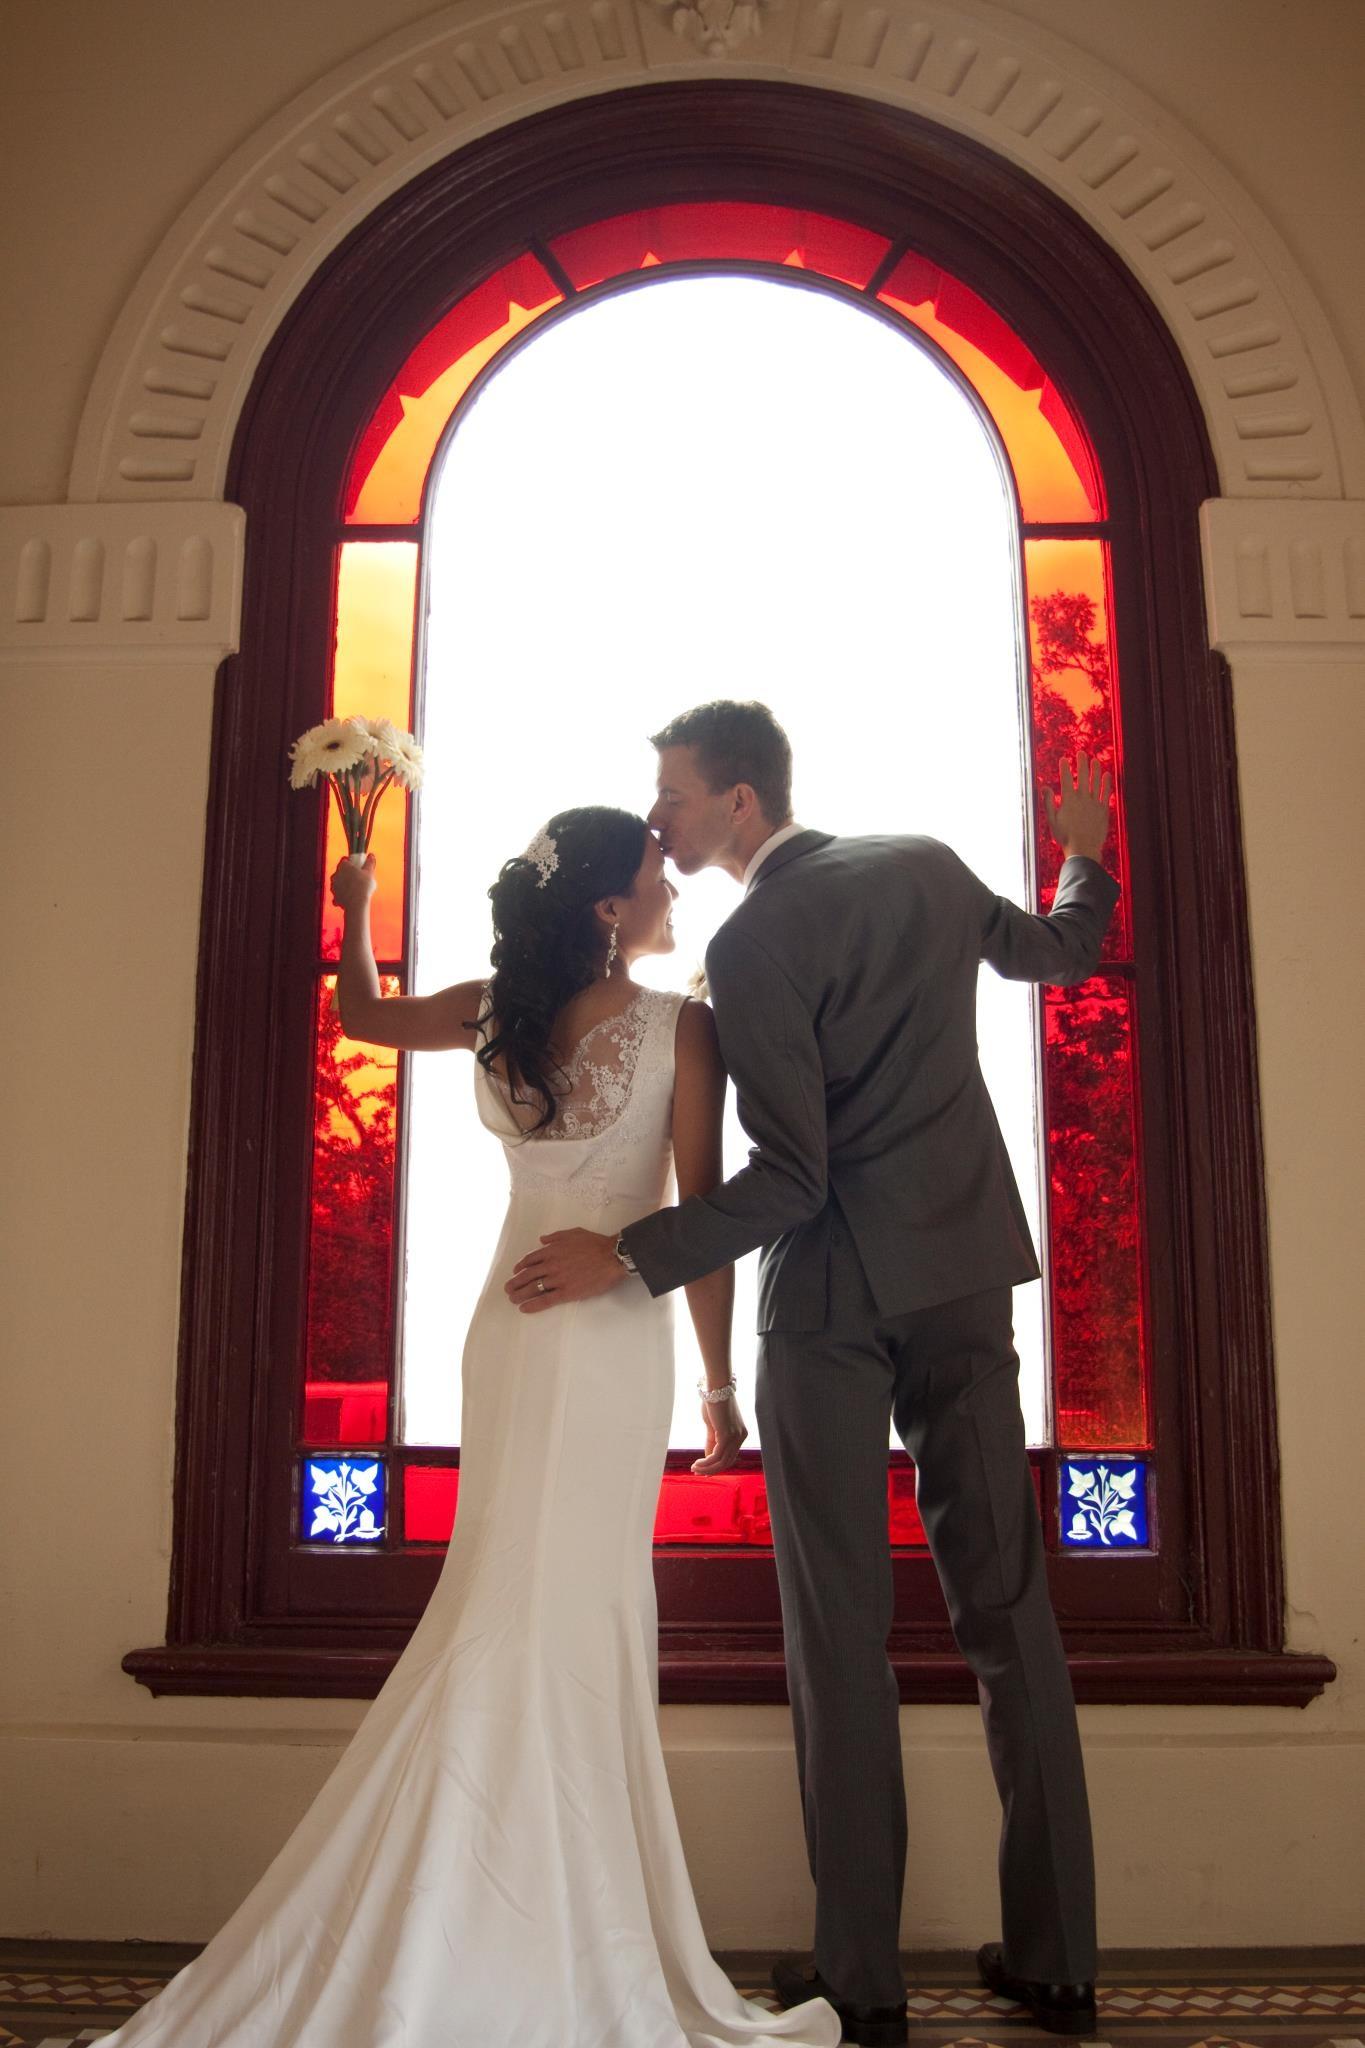 Claudia Savage - Simple wedding gown